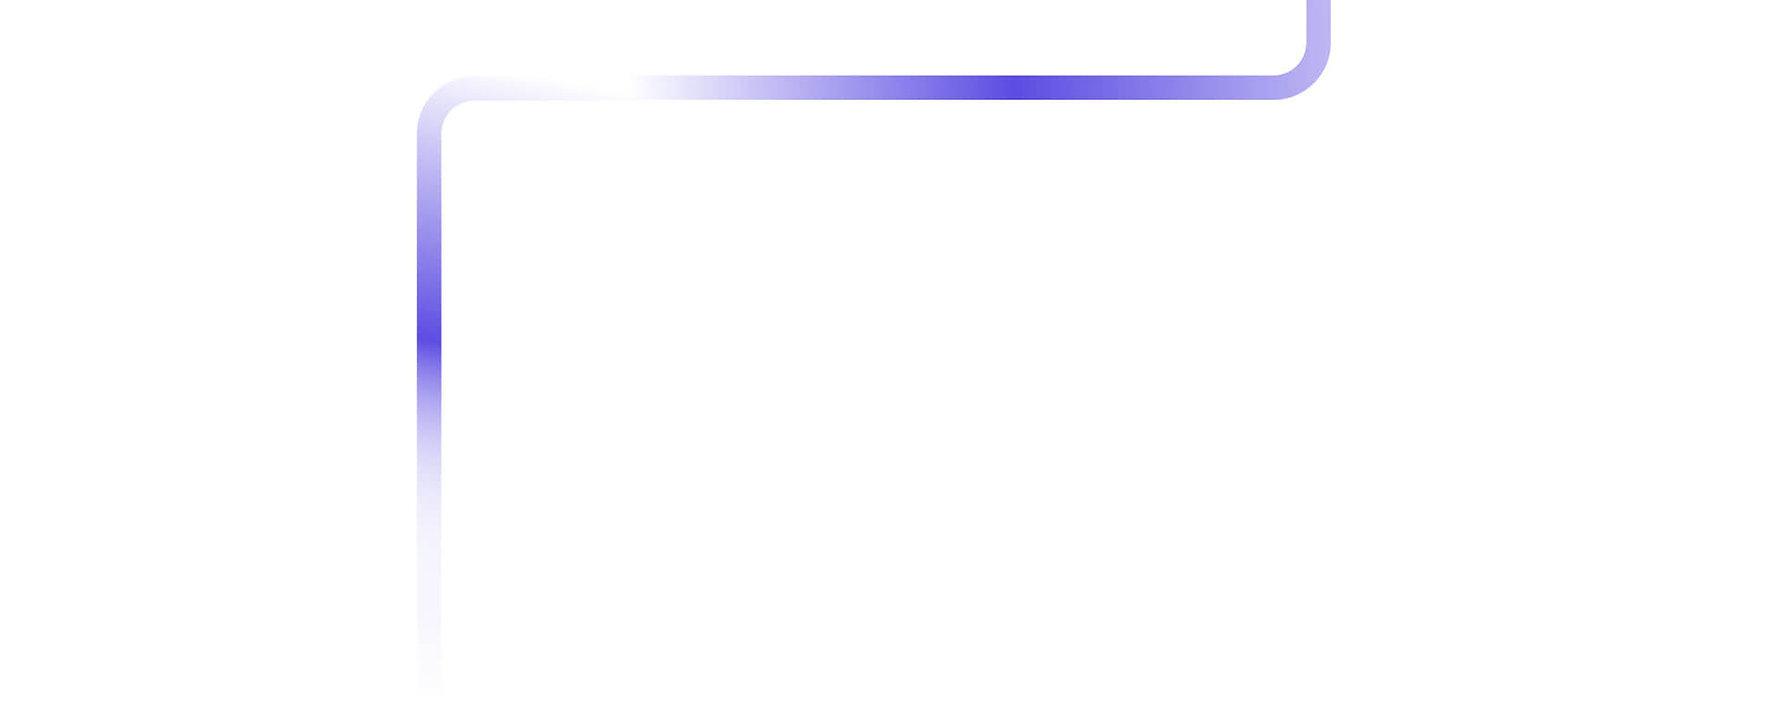 Exted_(JPEG)V12.0 KTL Website-SHEQ-4 cop